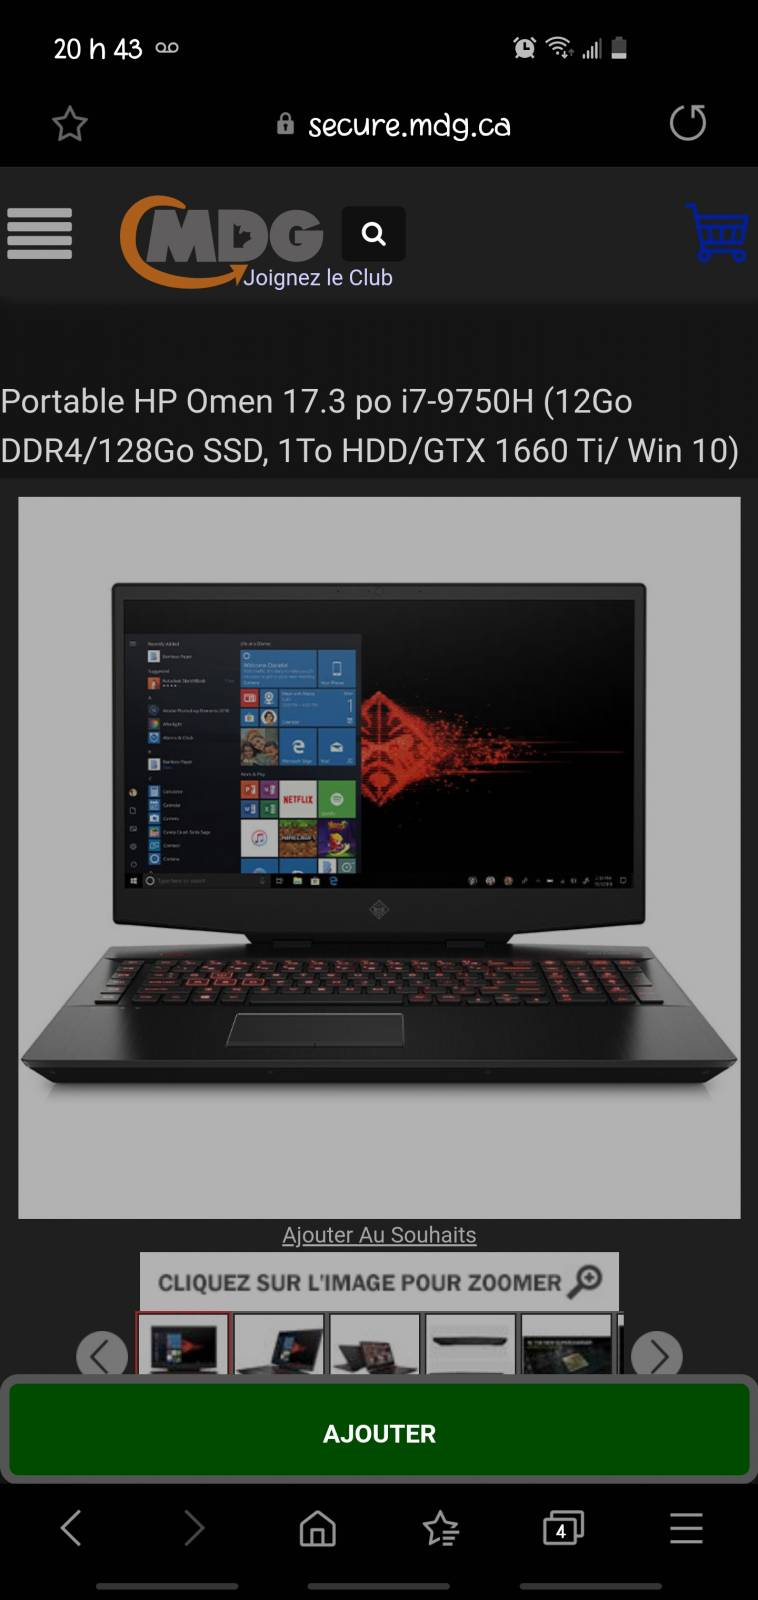 Screenshot_20200806-204350_SamsungInternet.jpg